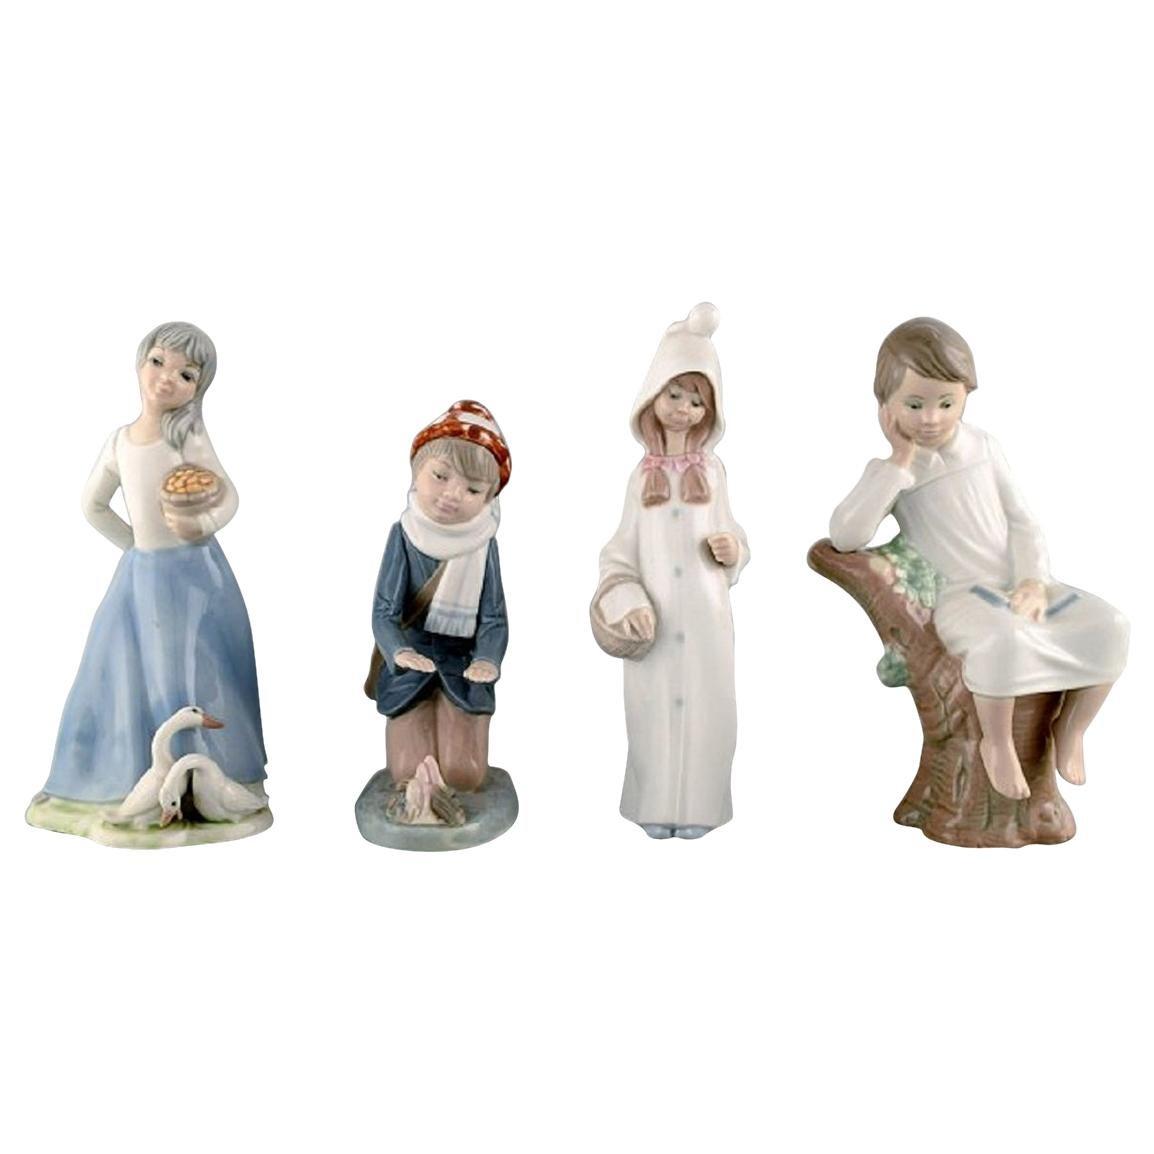 Lladro, Tengra and Zaphir, Spain, Four Porcelain Figurines of Children